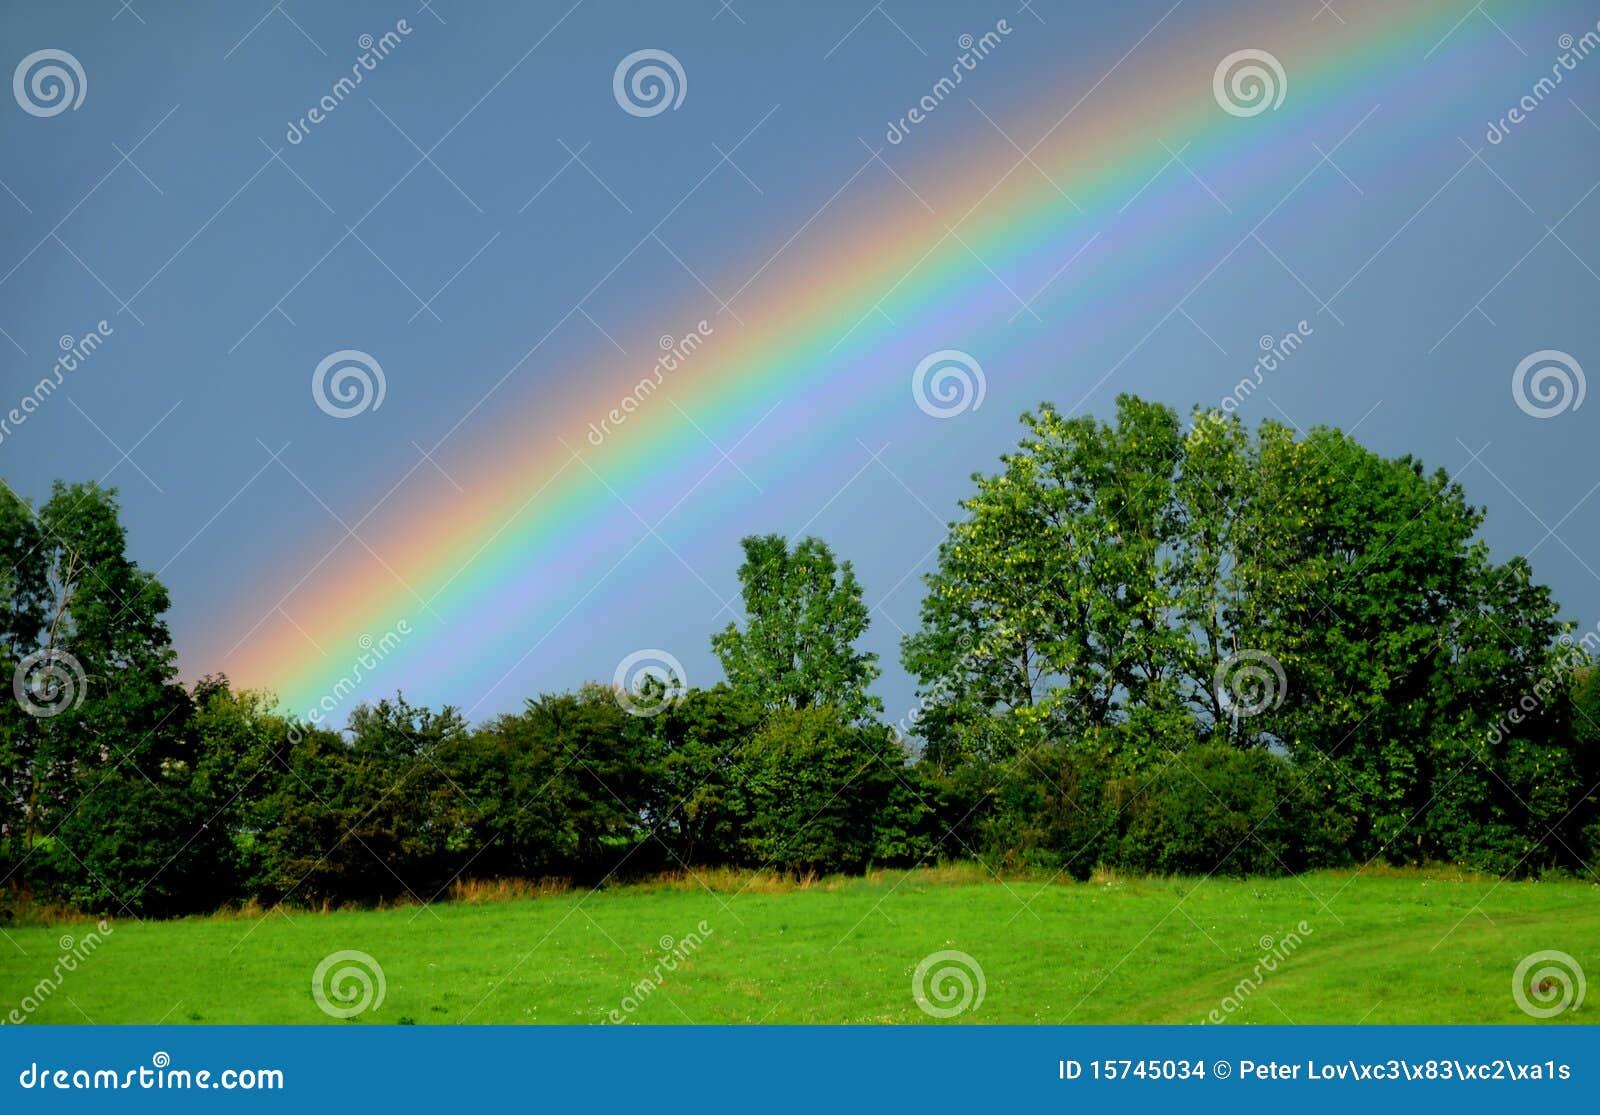 Arco-íris sobre árvores